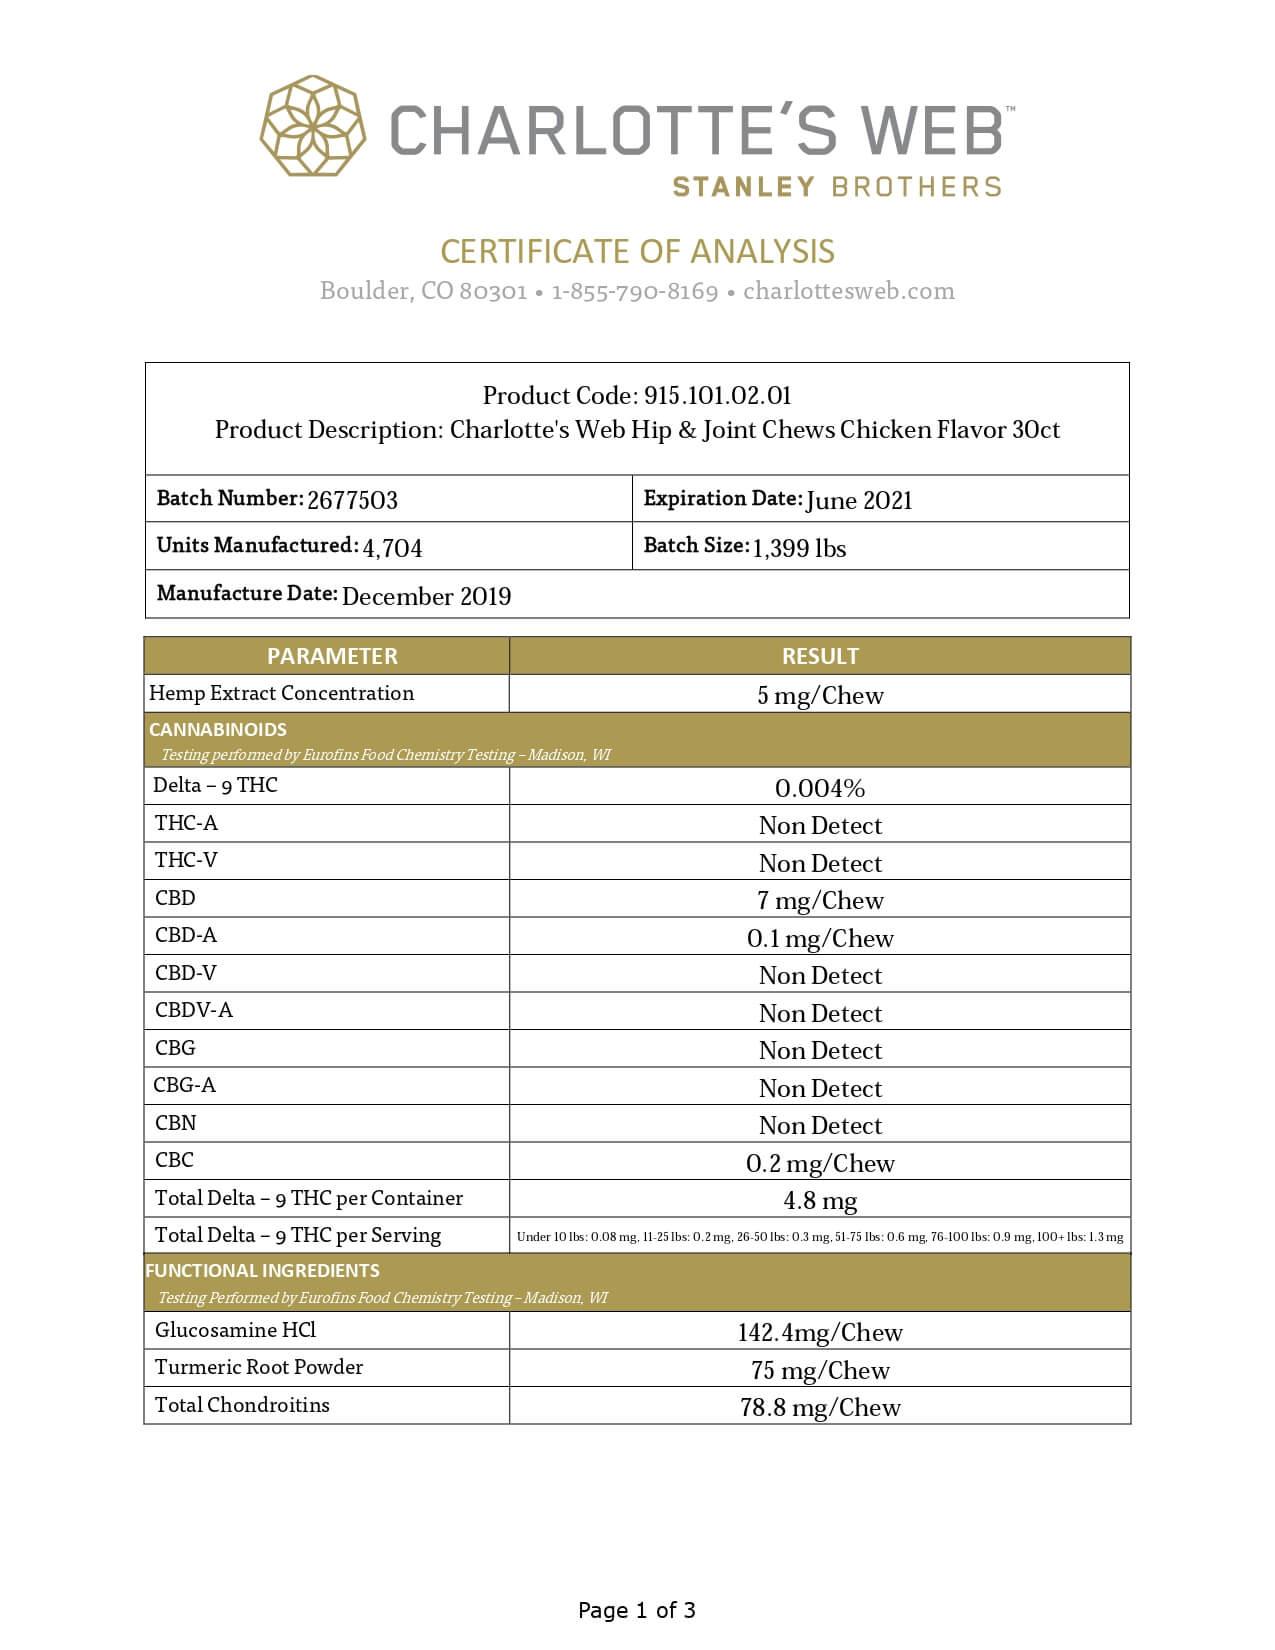 Charlottes Web CBD Pet Edible Full Spectrum Hip & Joint Chews Lab Report